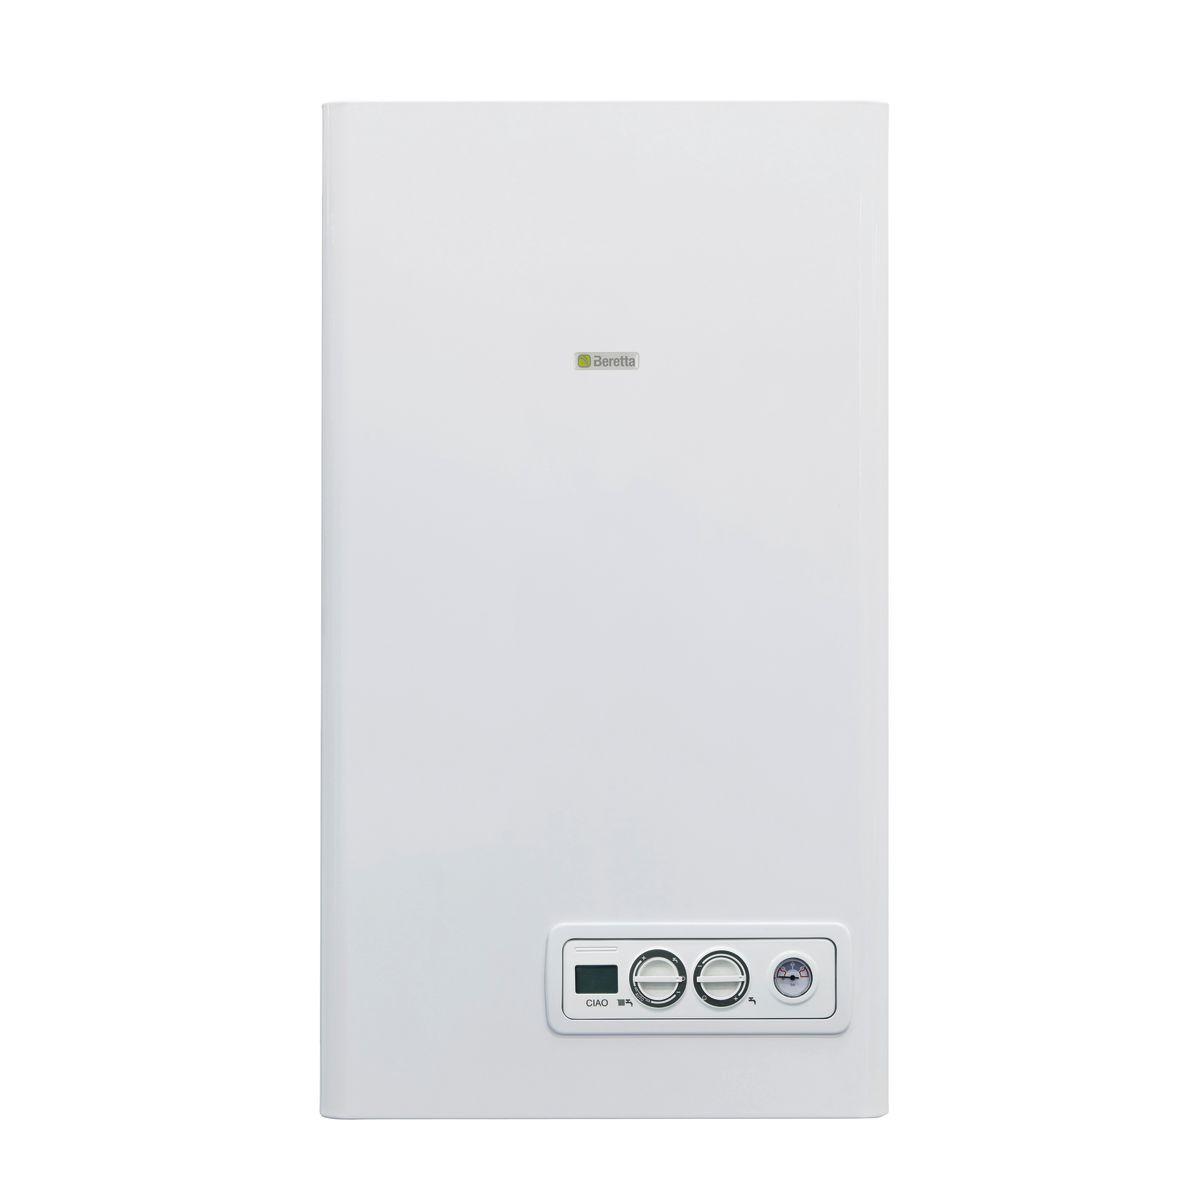 Caldaie a condensazione, a camera stagna o aperta, 24 kw o 28 kw